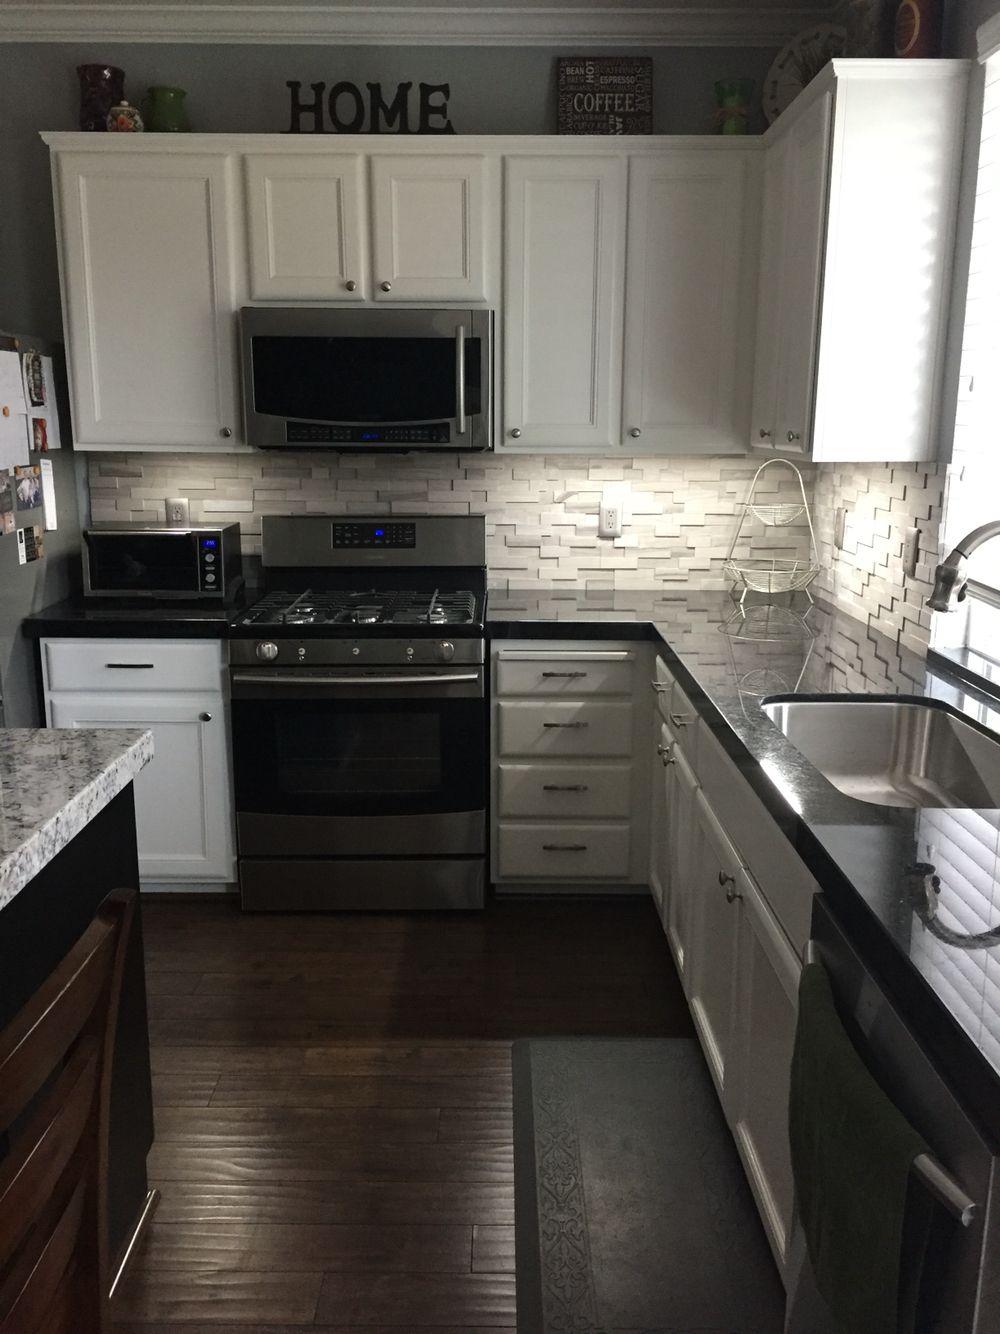 countertops for kitchens Black granite with a gray stone backsplash